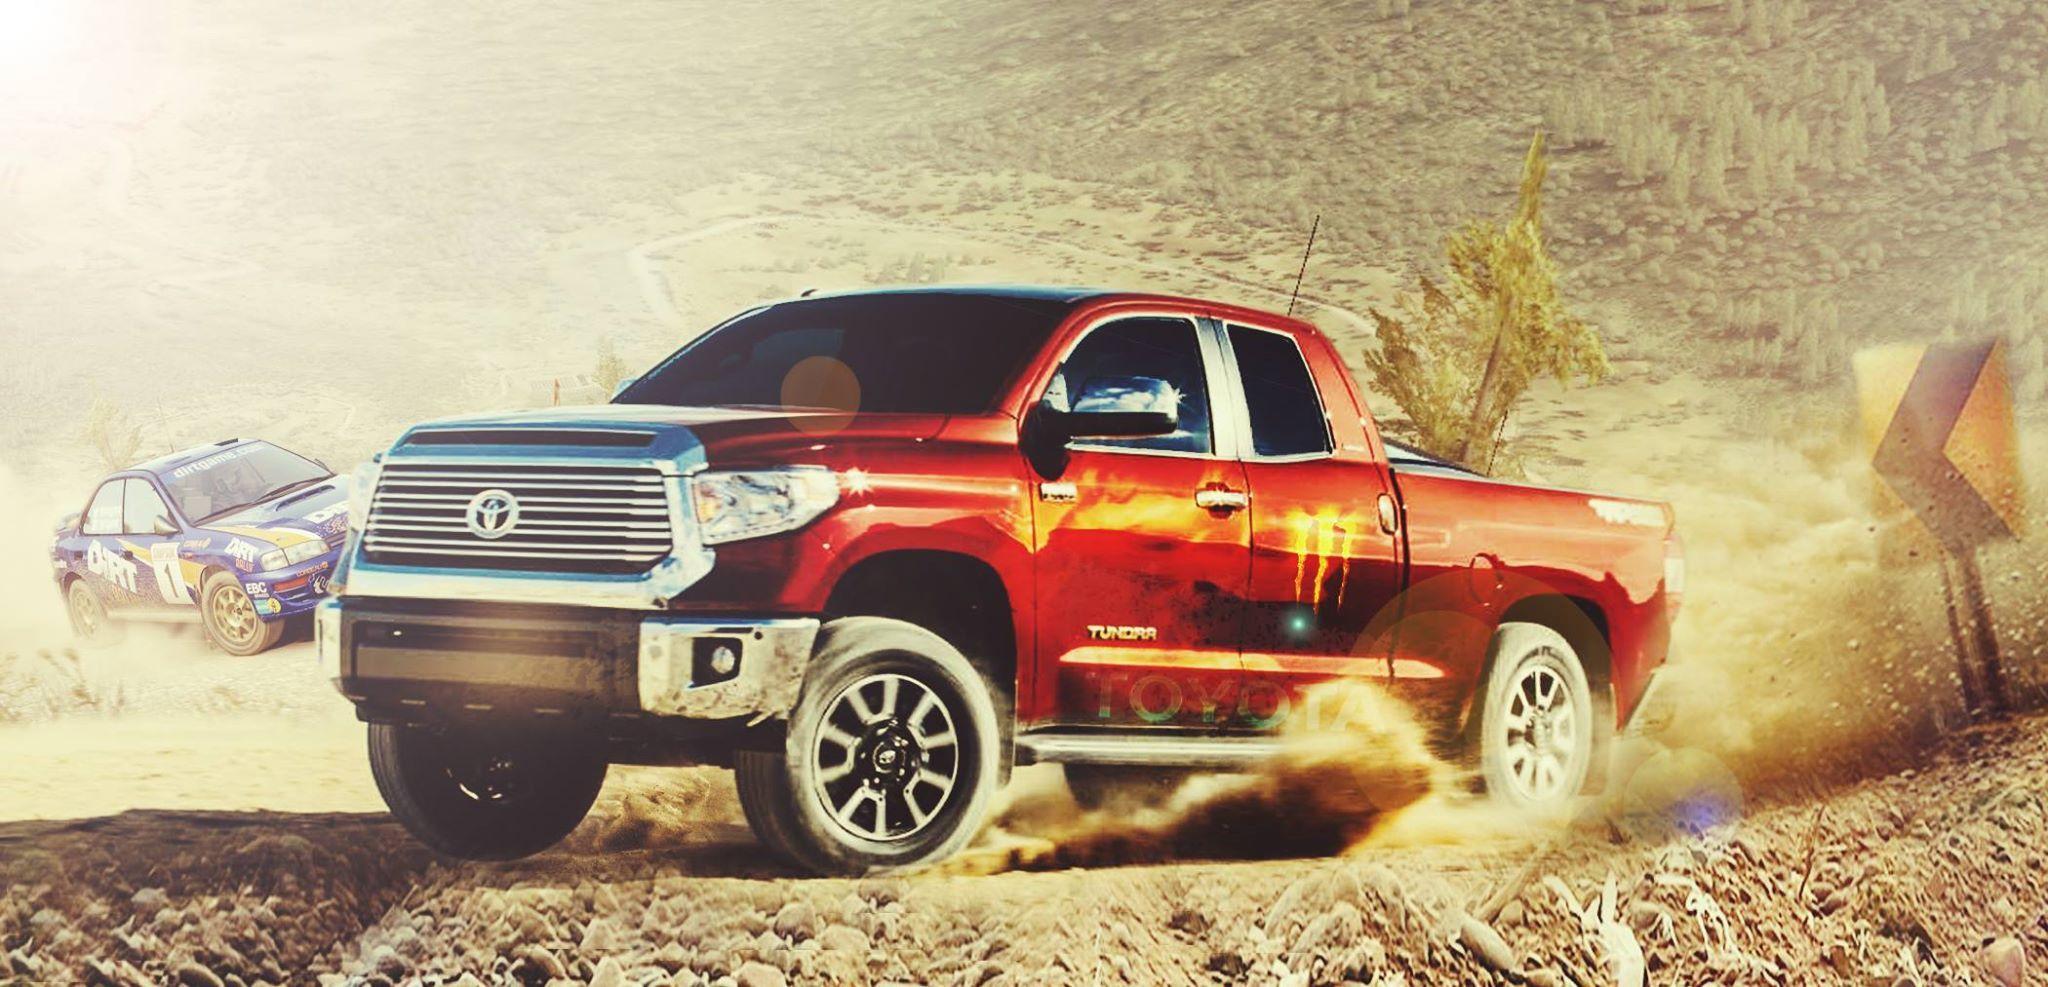 2018 Toyota Tundra Diesel Release Beautiful cars